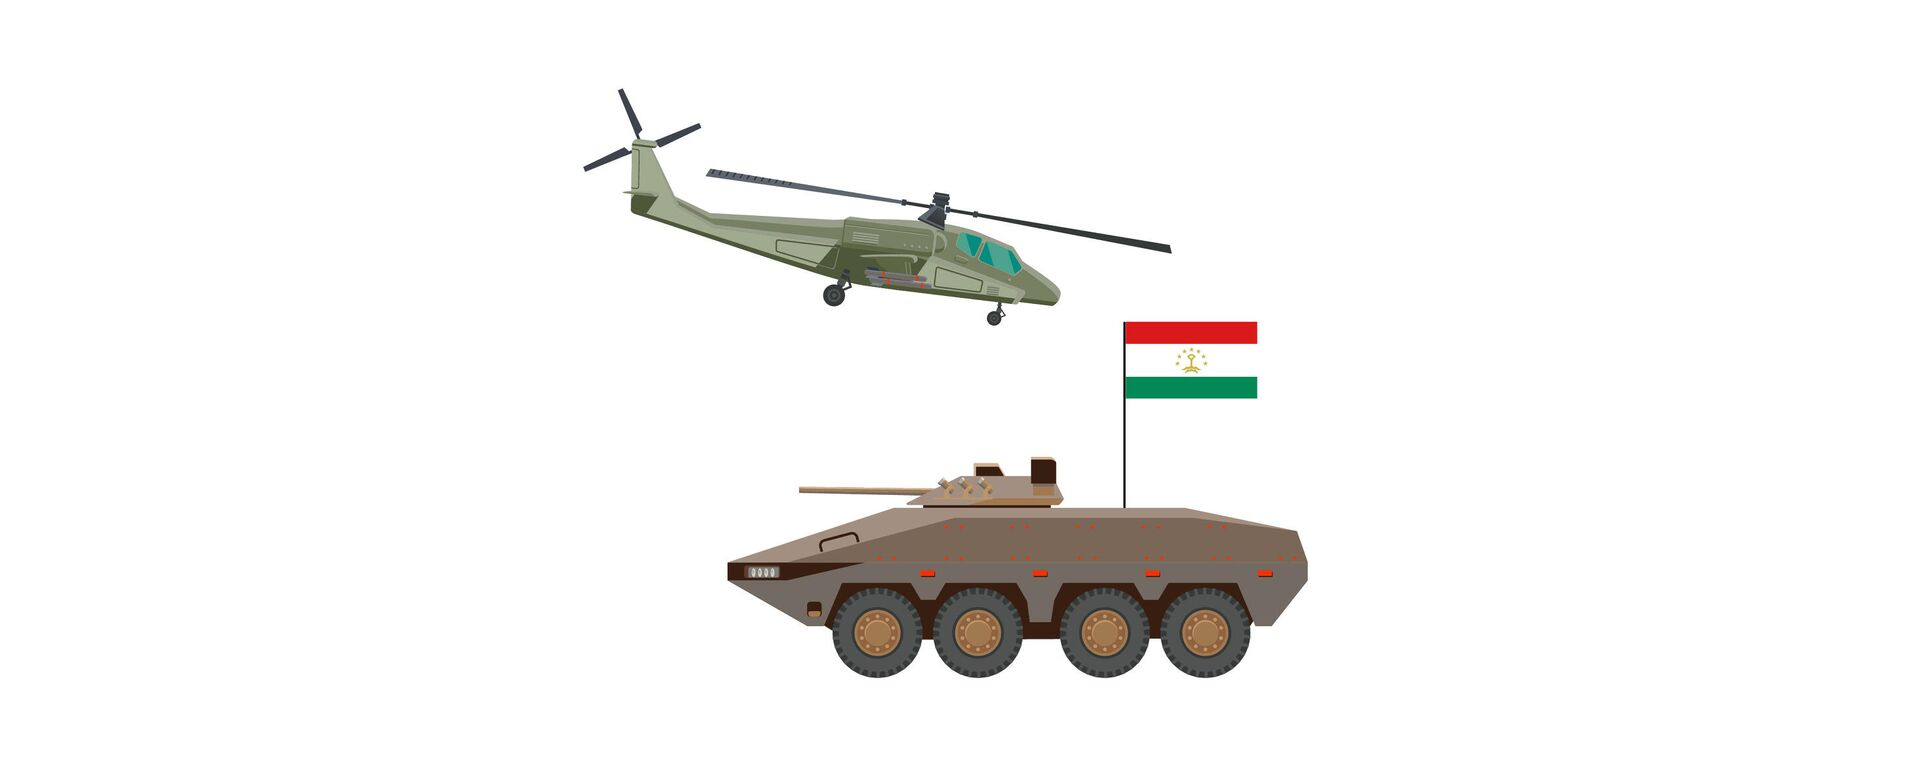 Военная мощь и сила Таджикистана в цифрах - Sputnik Таджикистан, 1920, 10.08.2021